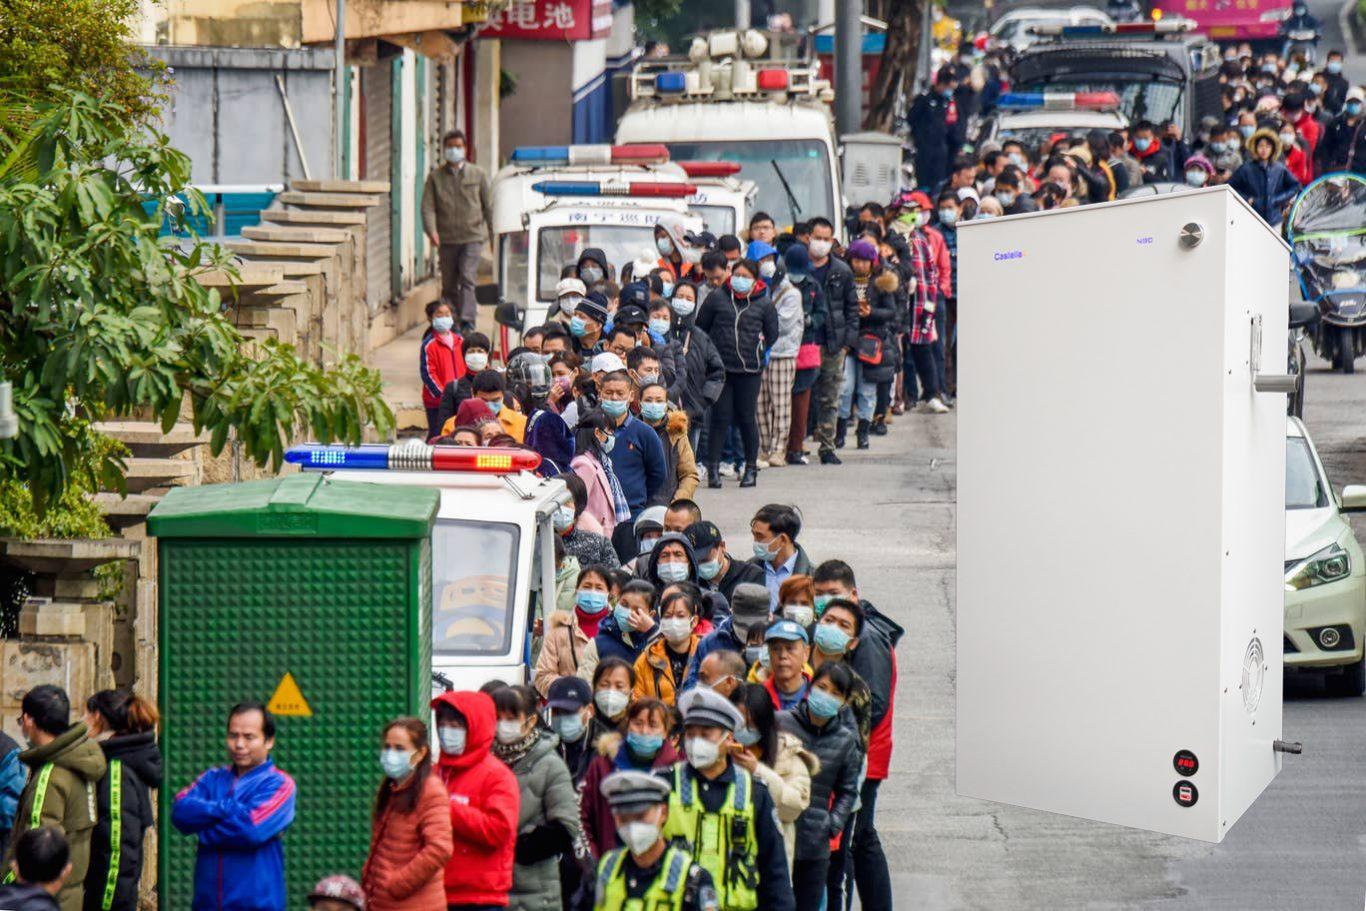 Coronavirus In Wuhan